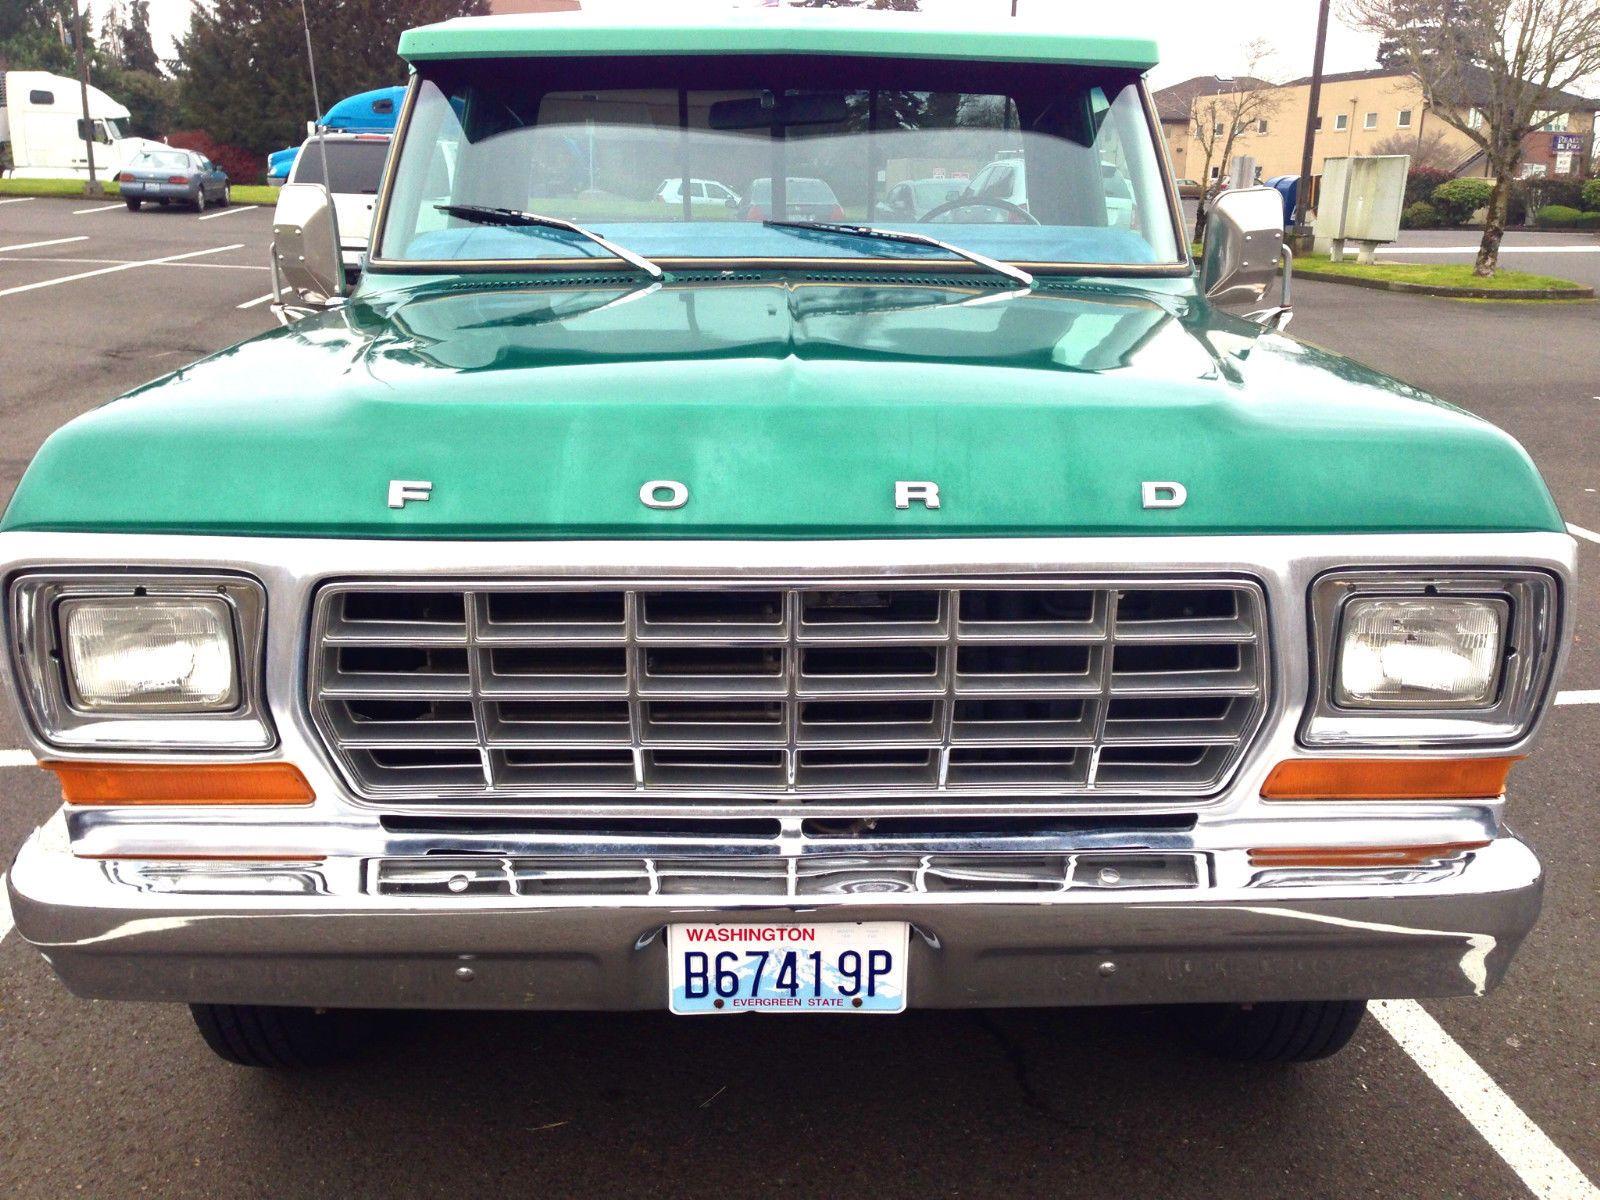 hight resolution of 1978 ford f 350 xlt ranger camper special 2wd automatic transmission 460cu v8